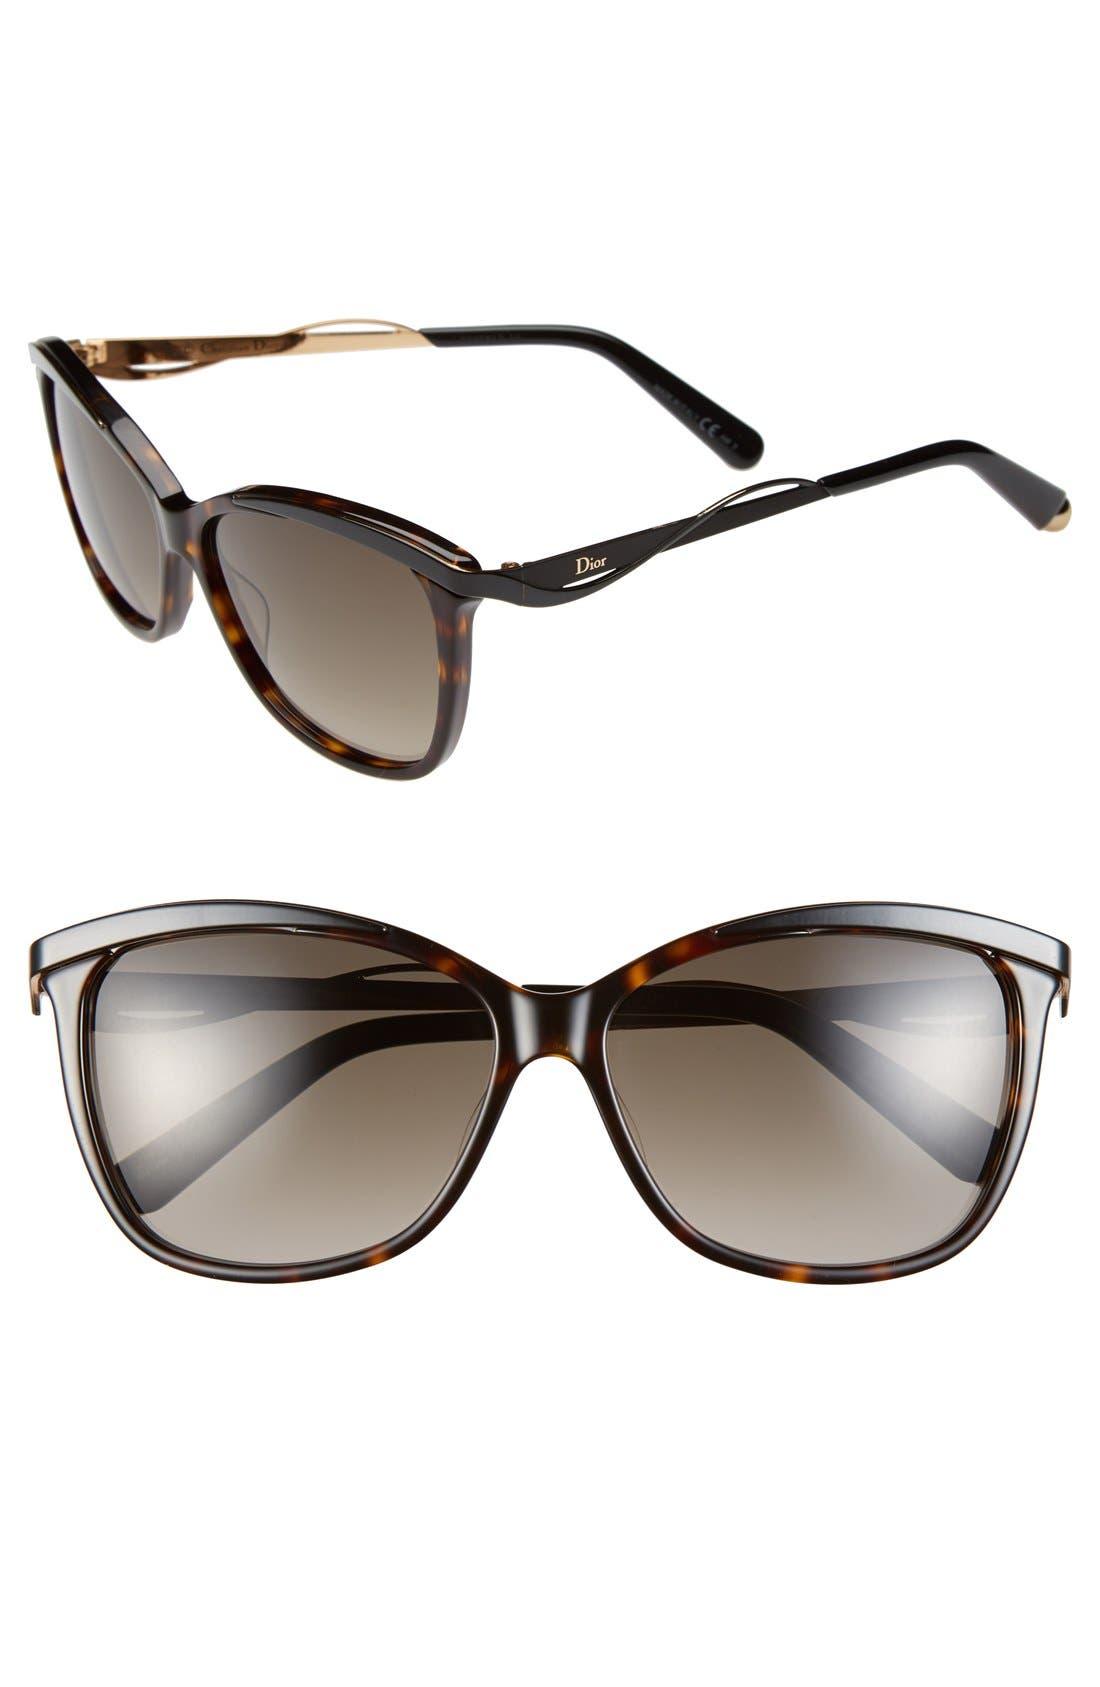 Alternate Image 1 Selected - Dior Metal Eyes 2 57mm Sunglasses